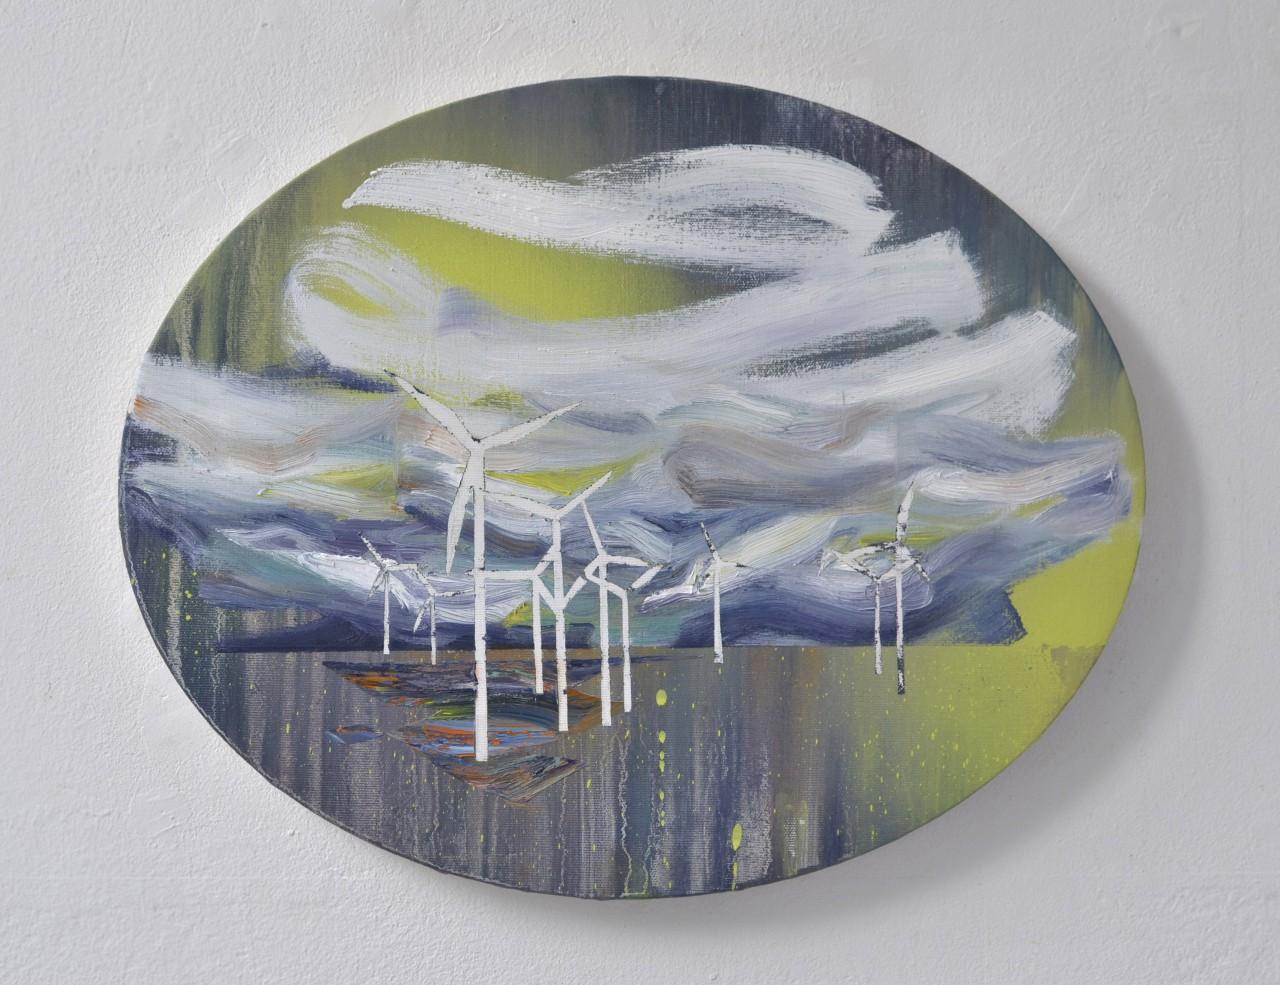 Barnim II | oil on canvas | 40 x 50 cm | 2015